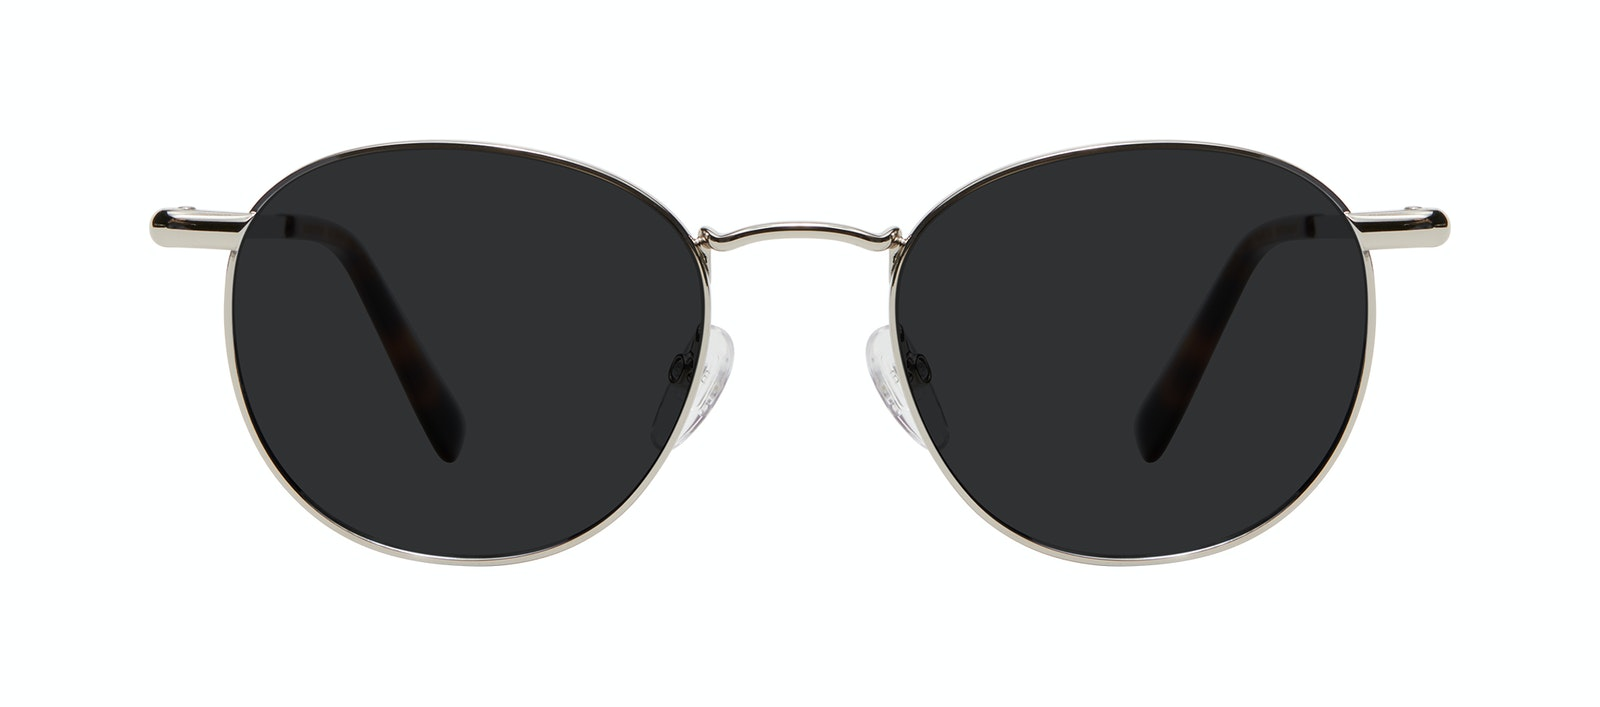 Affordable Fashion Glasses Round Sunglasses Men Women Divine L Silver Front